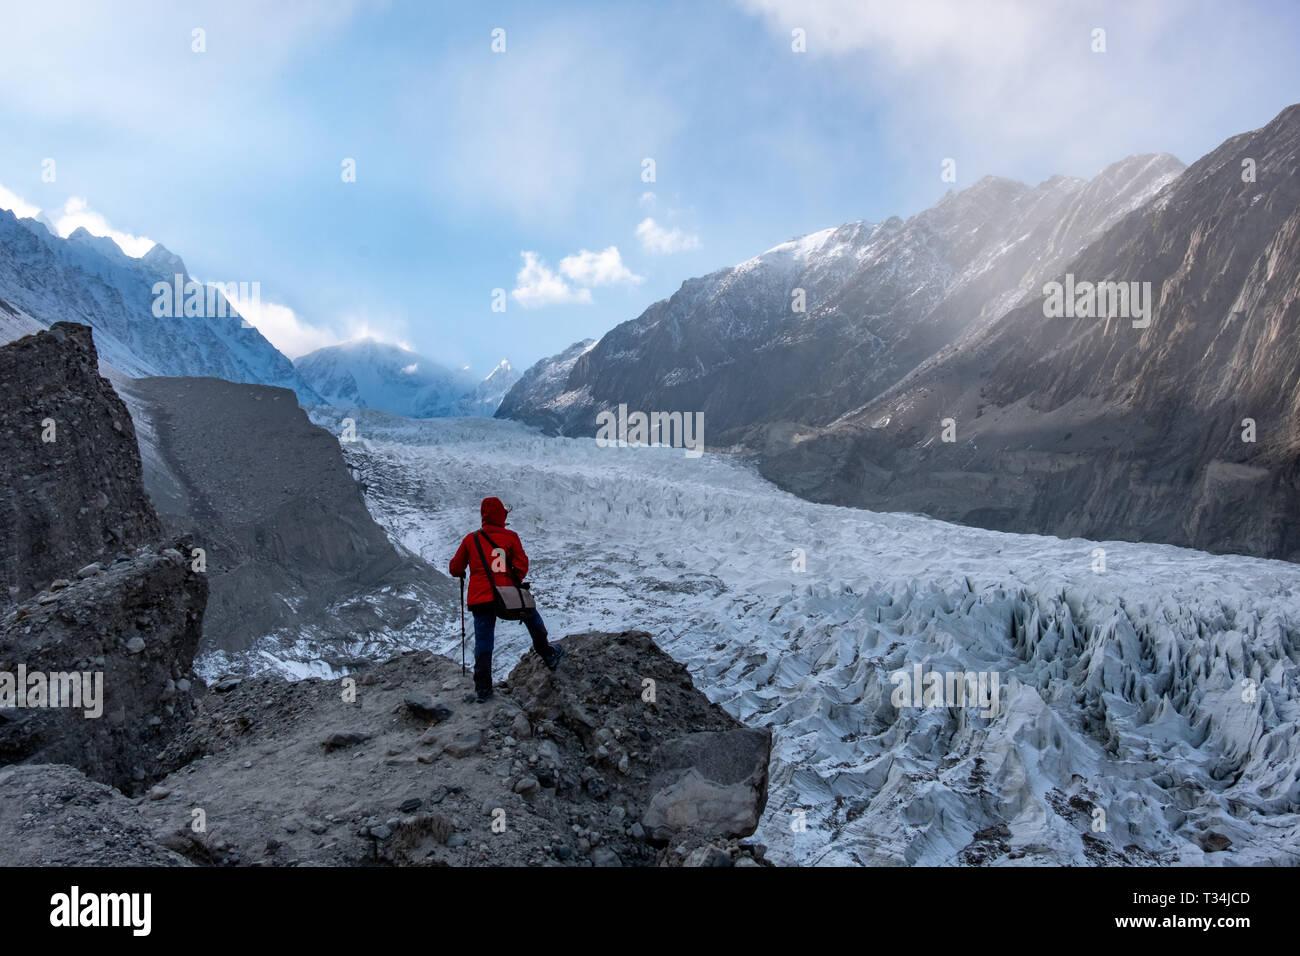 Woman looking at the Passu Glacier, Gilgit-Baltistan, Pakistan - Stock Image